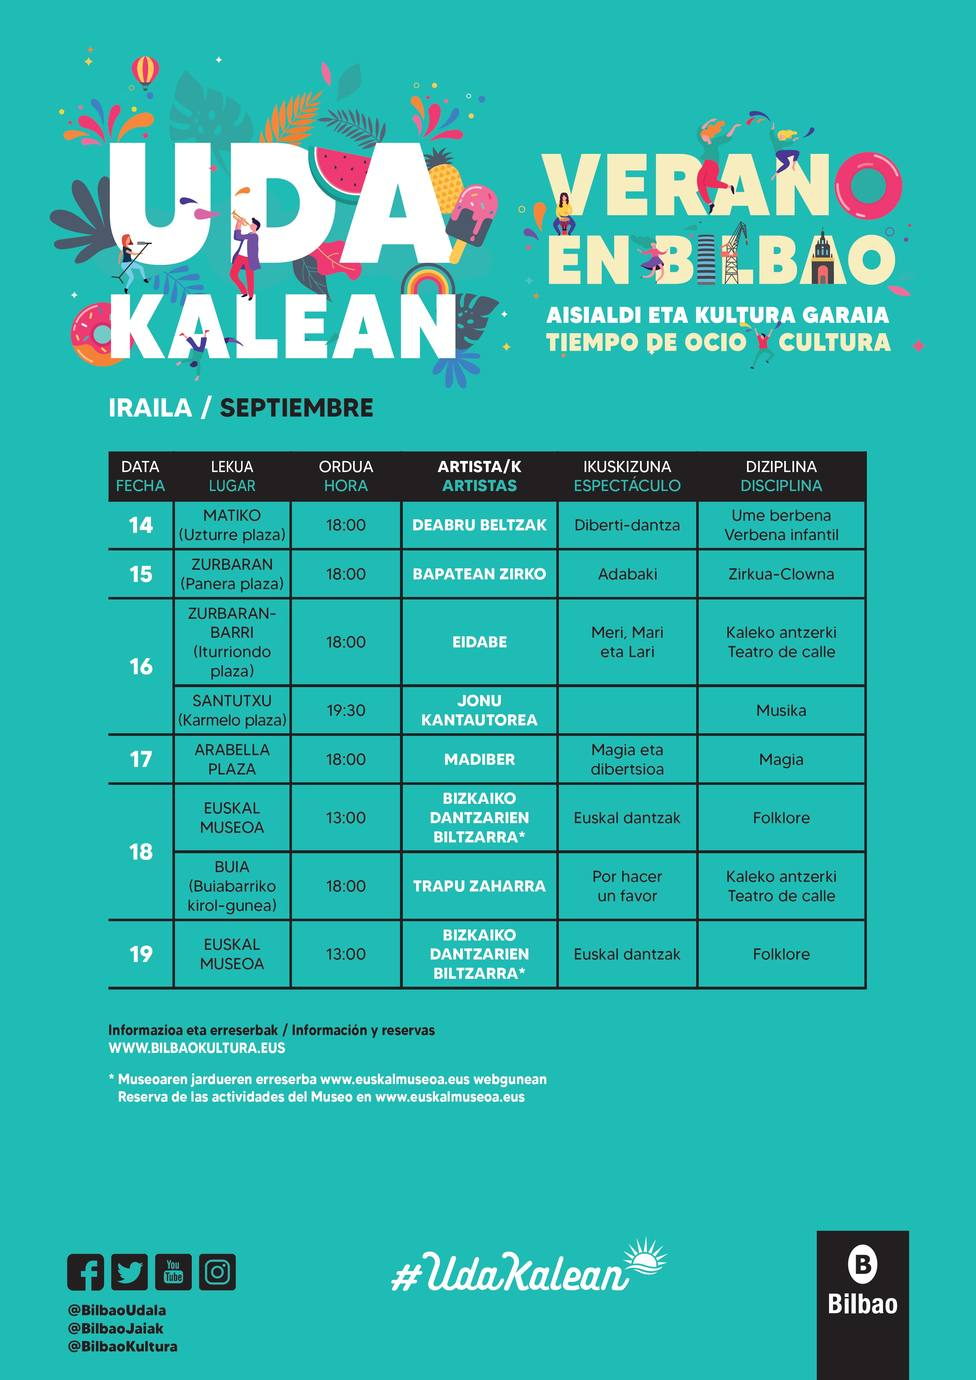 Programación cultural de Bilbao